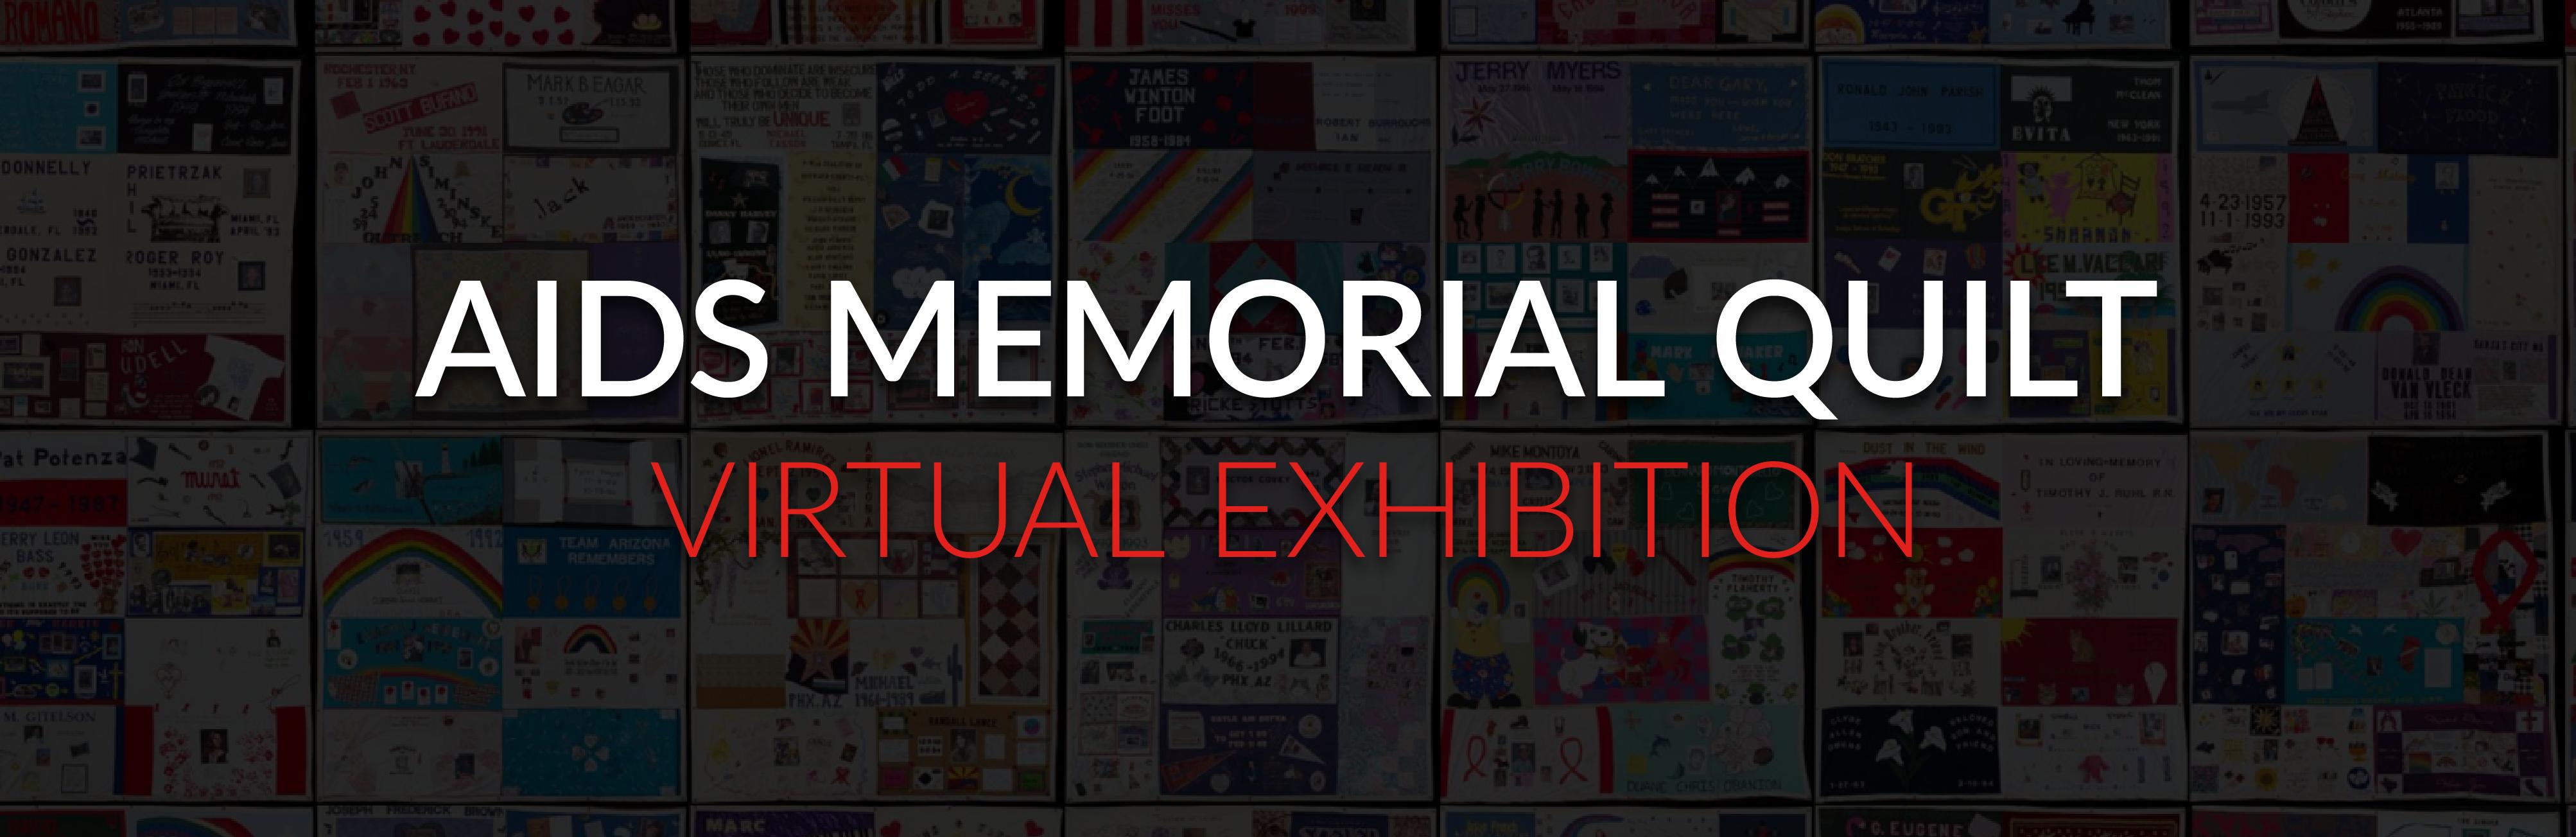 CC-2020-12-AIDS Memorial-Website-07